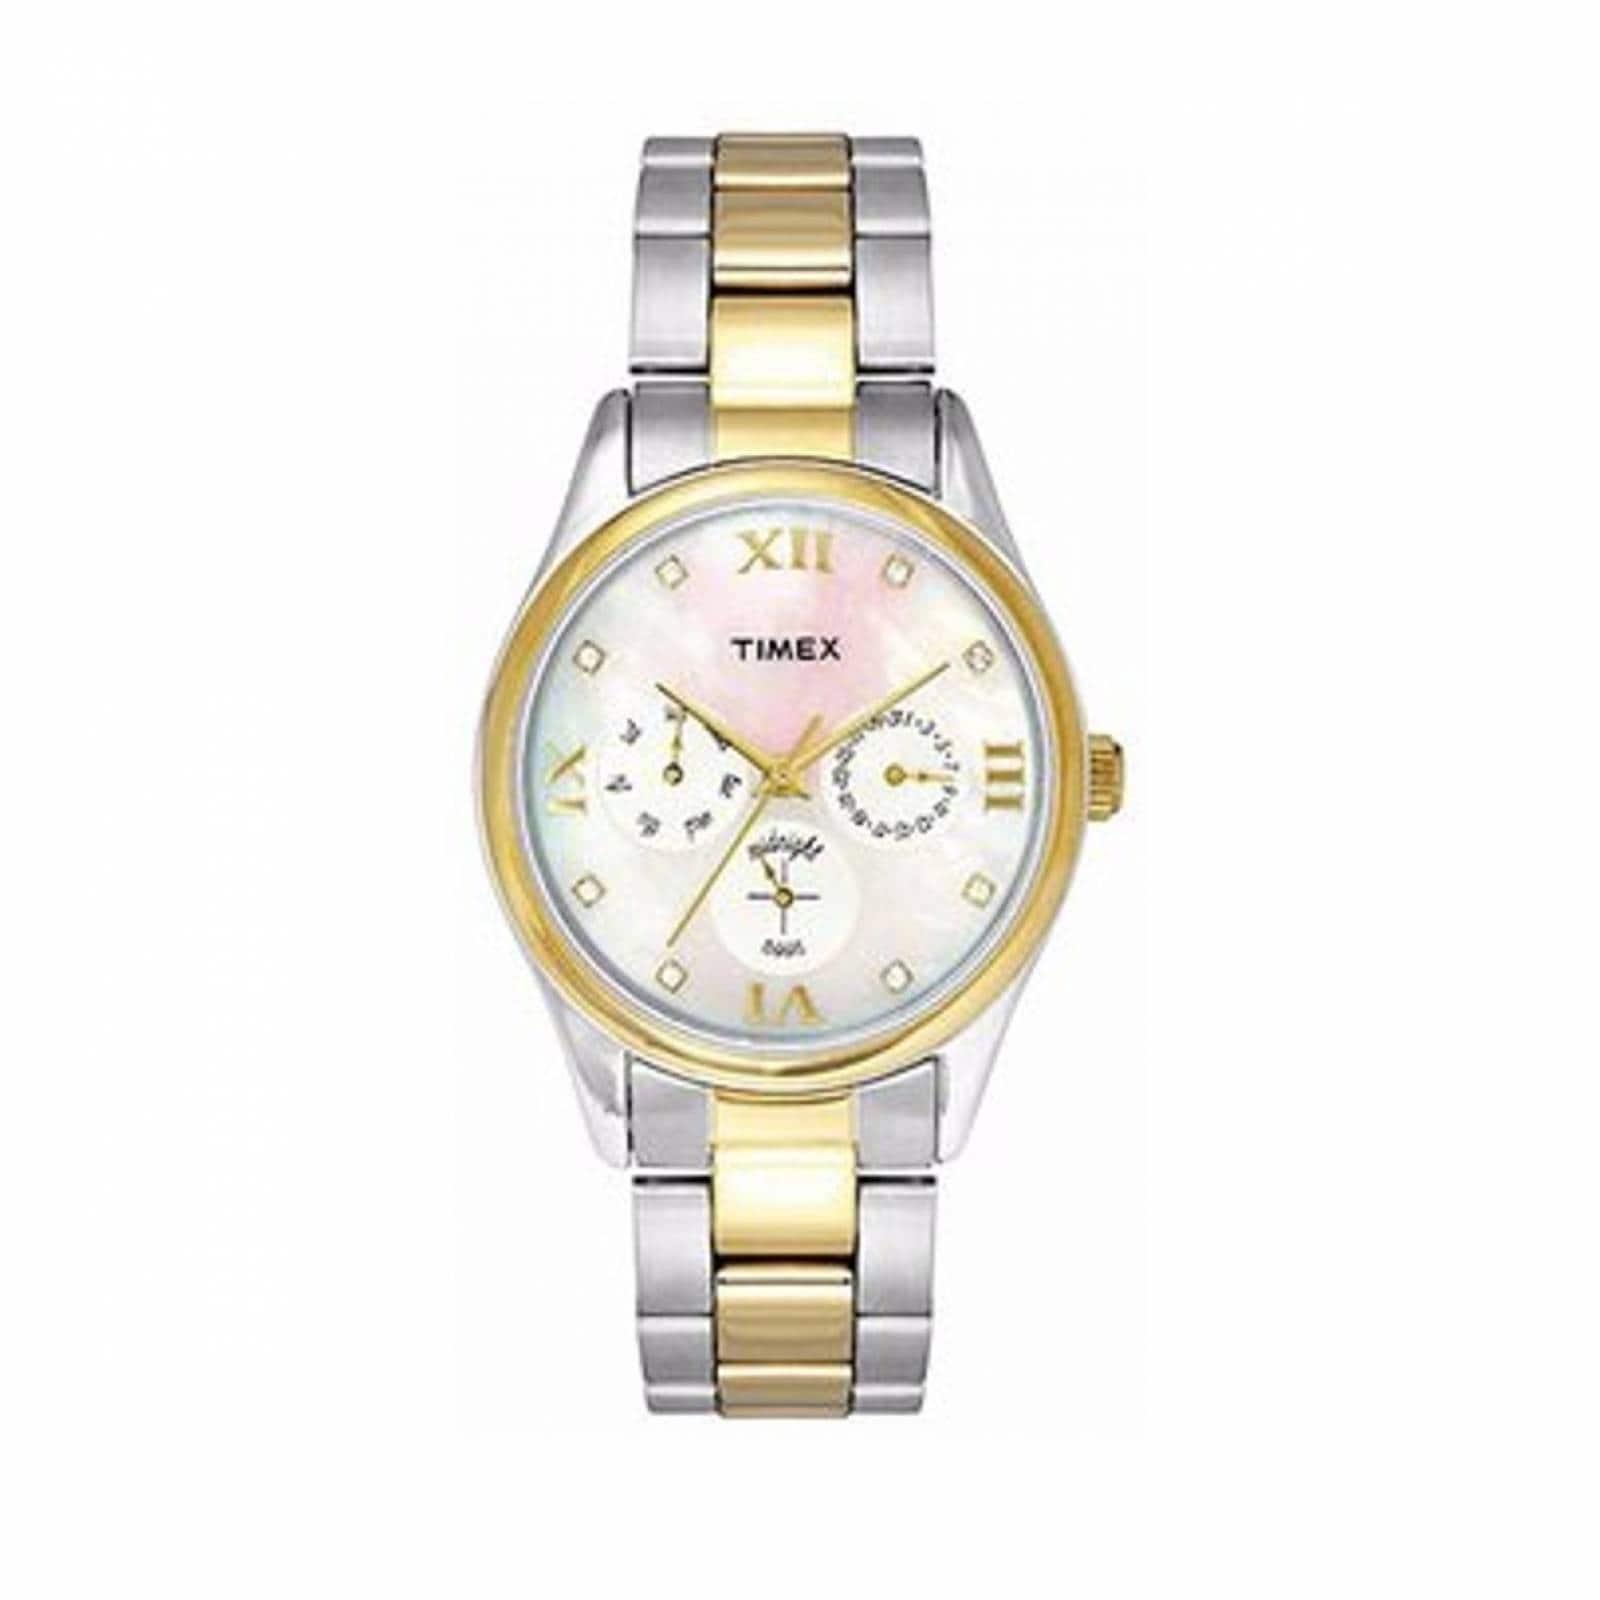 95a6ae4ede02 Reloj timex modelo  tw000w204